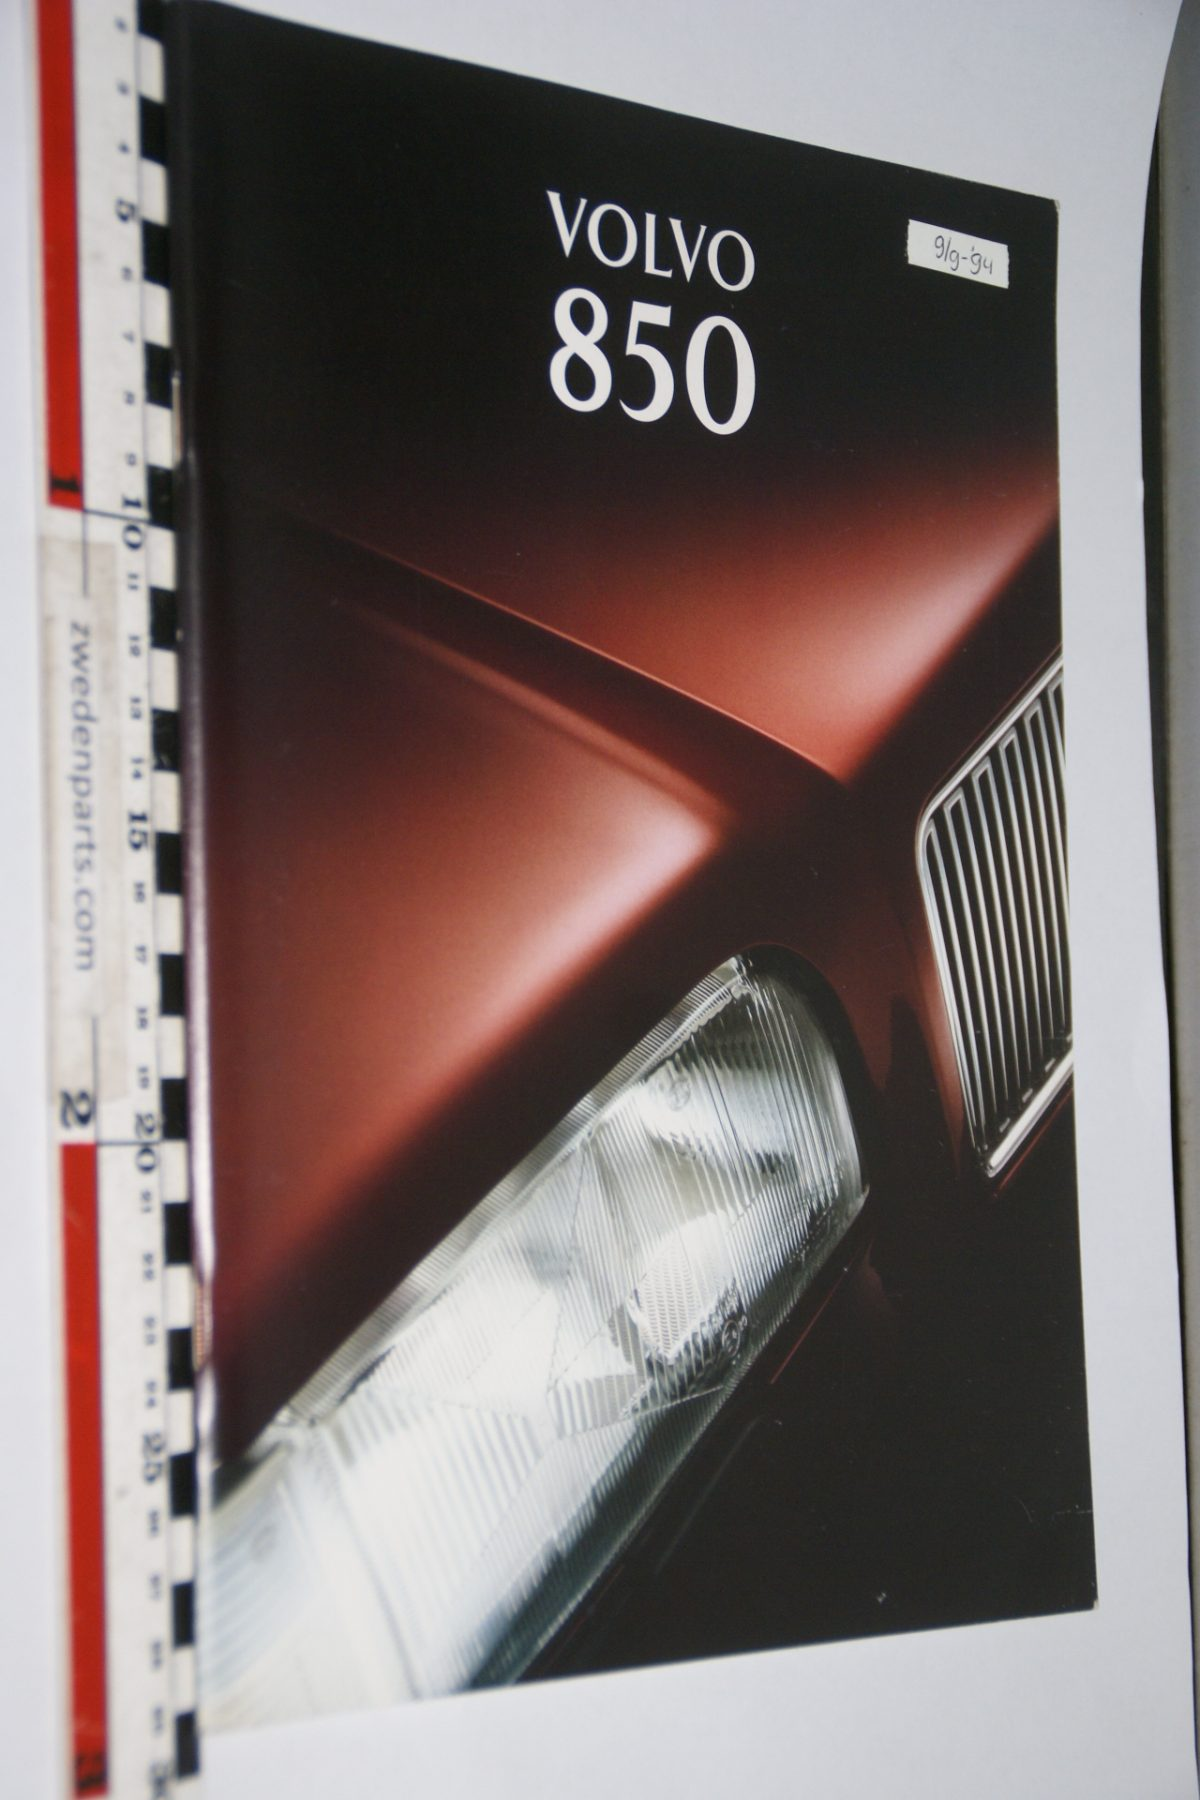 DSC06284 1995 brochure Volvo 850 nr MSPV 6635